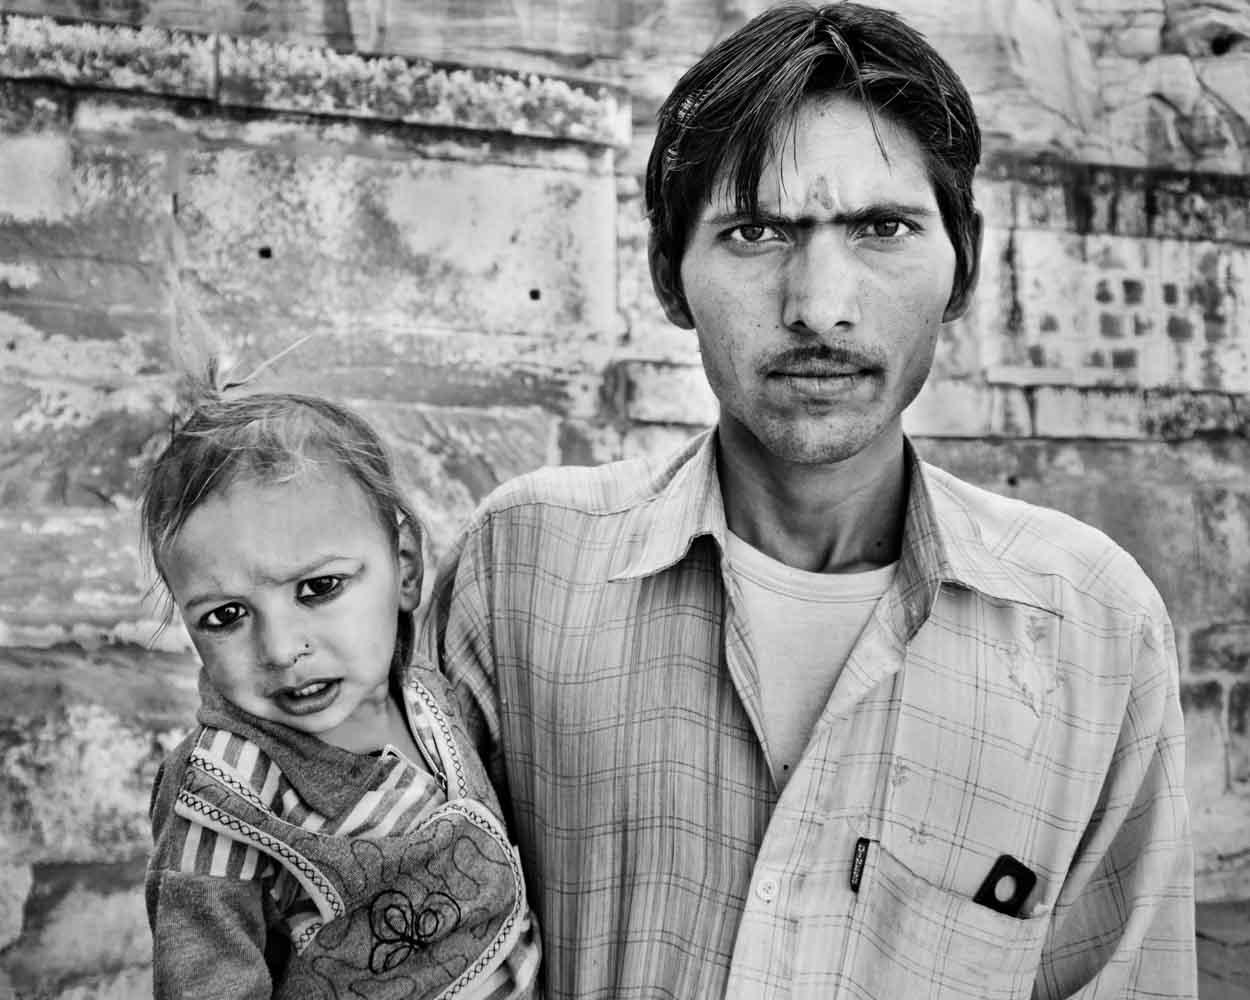 Man and his son Jaipur, Rajasthan